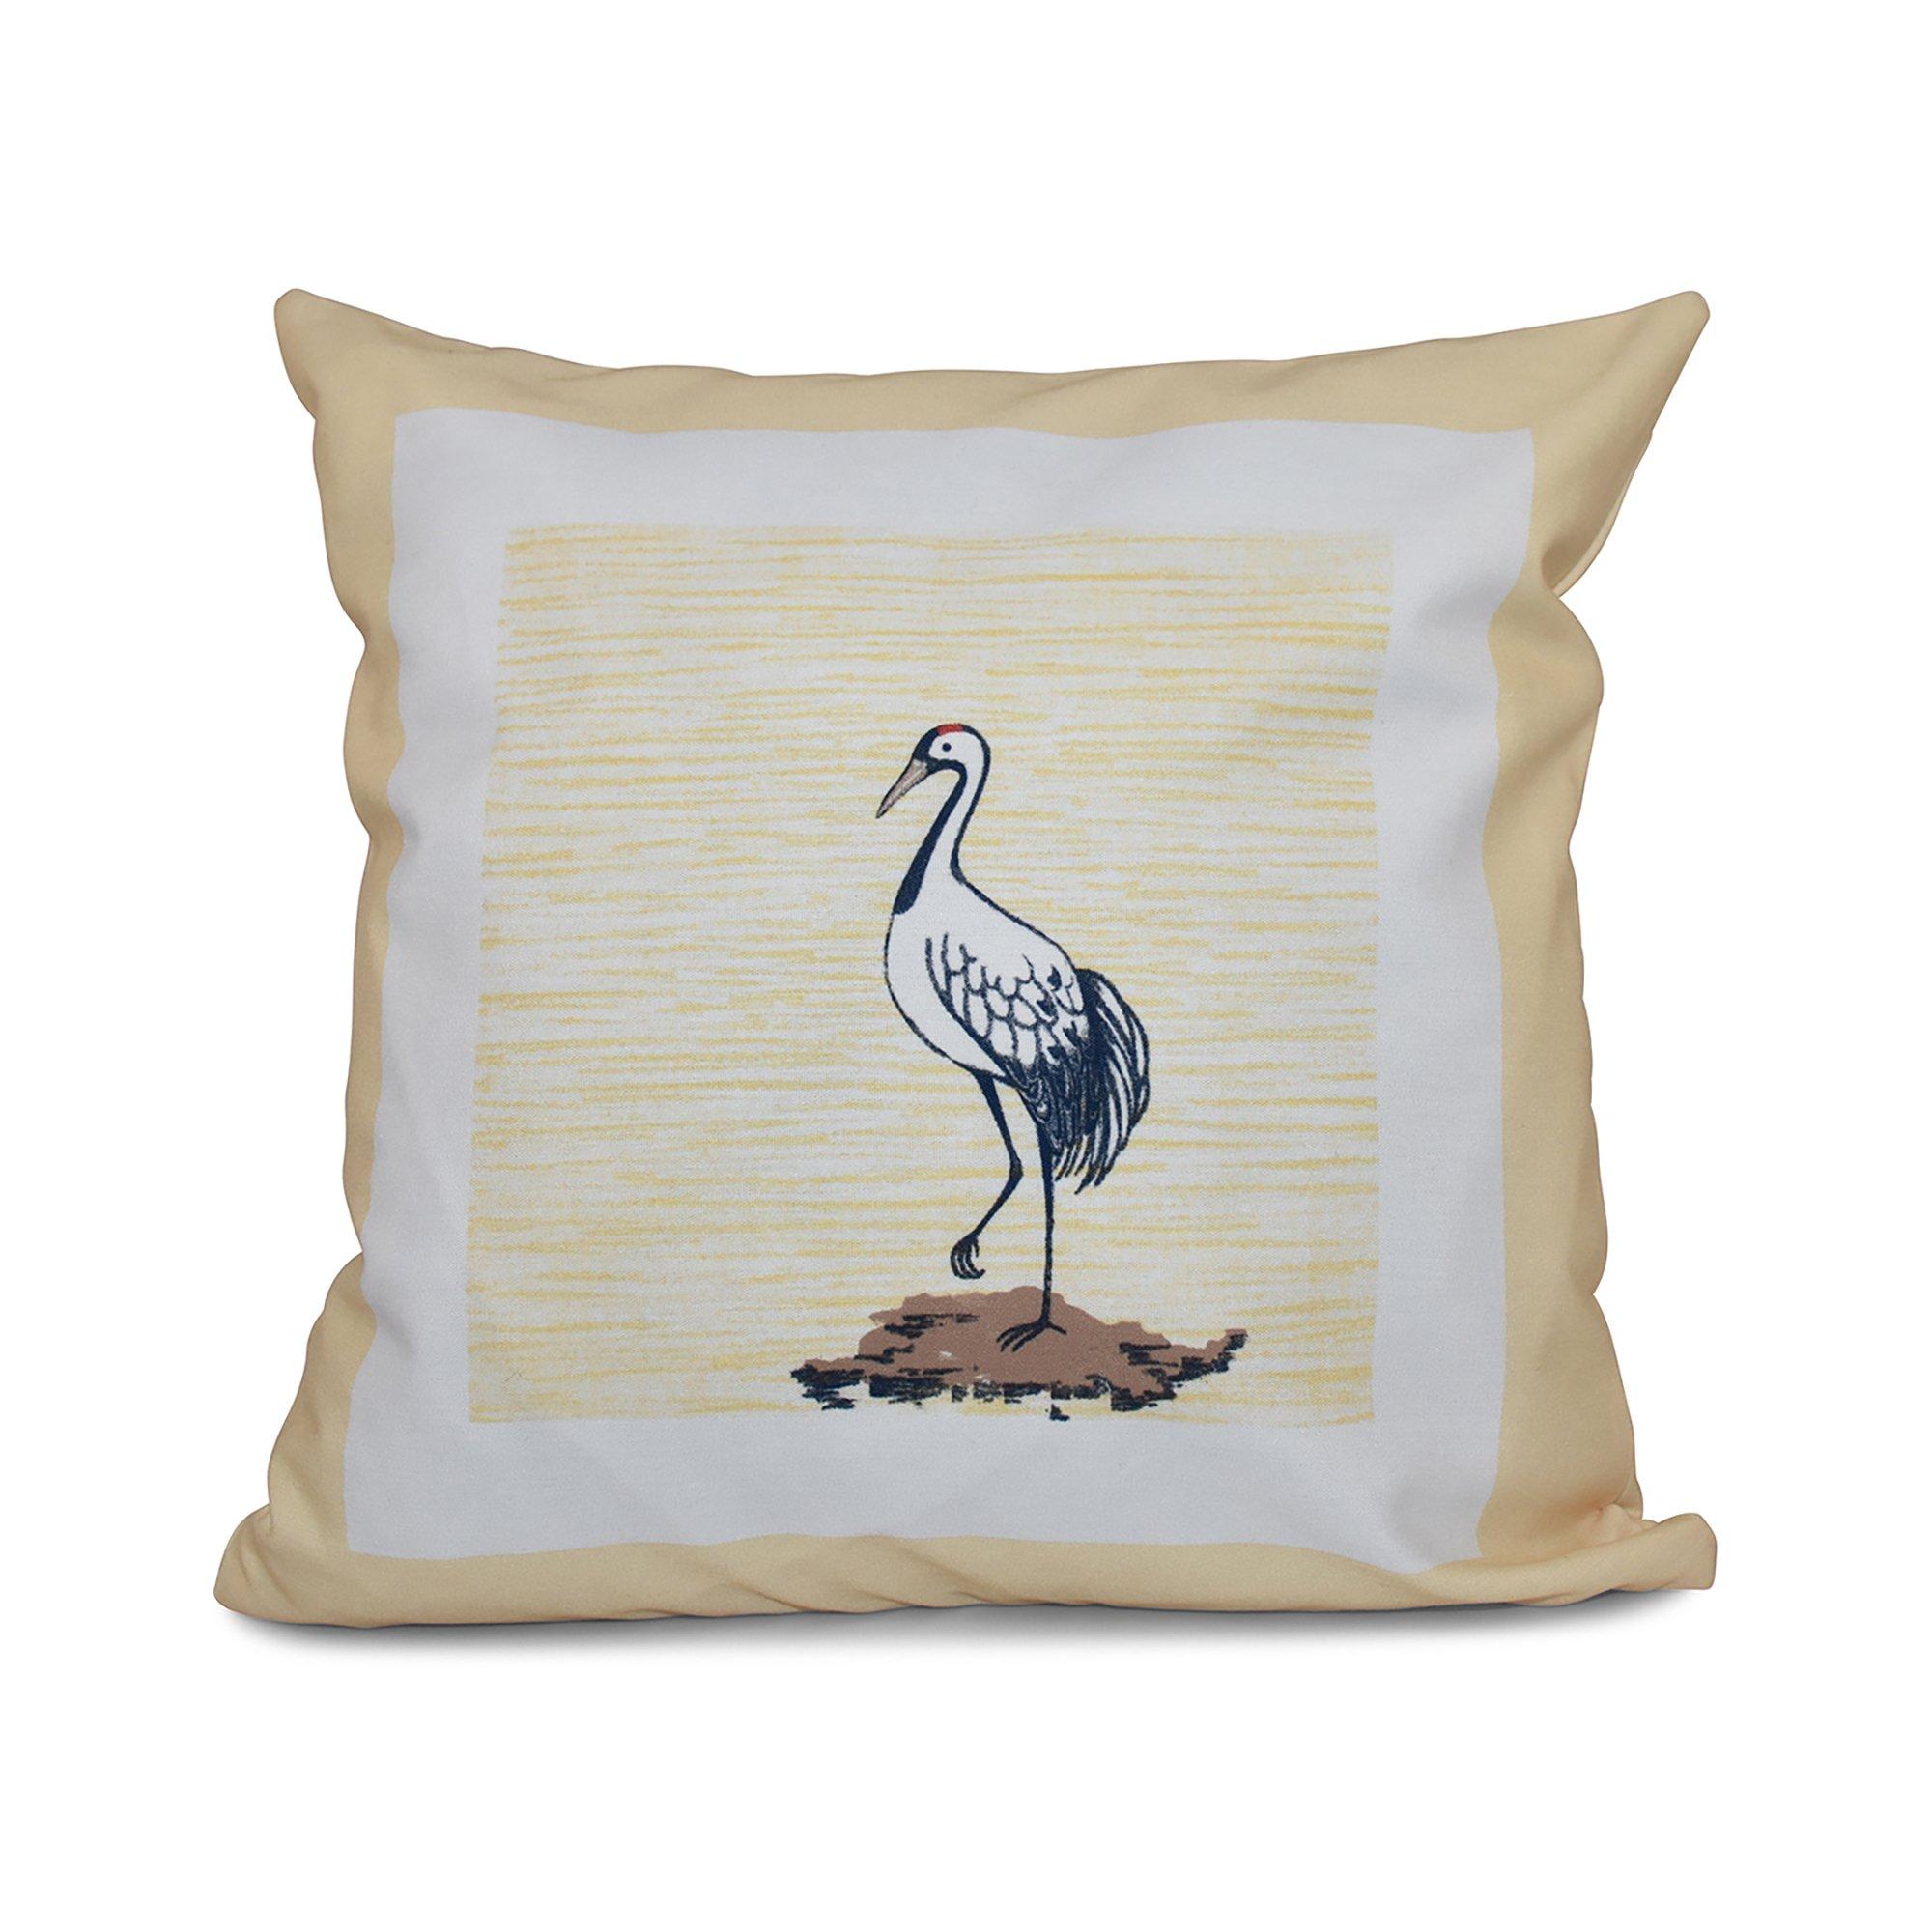 E by design 16 x 16 inch, Sandbar,Animal Print Pillow, Yellow